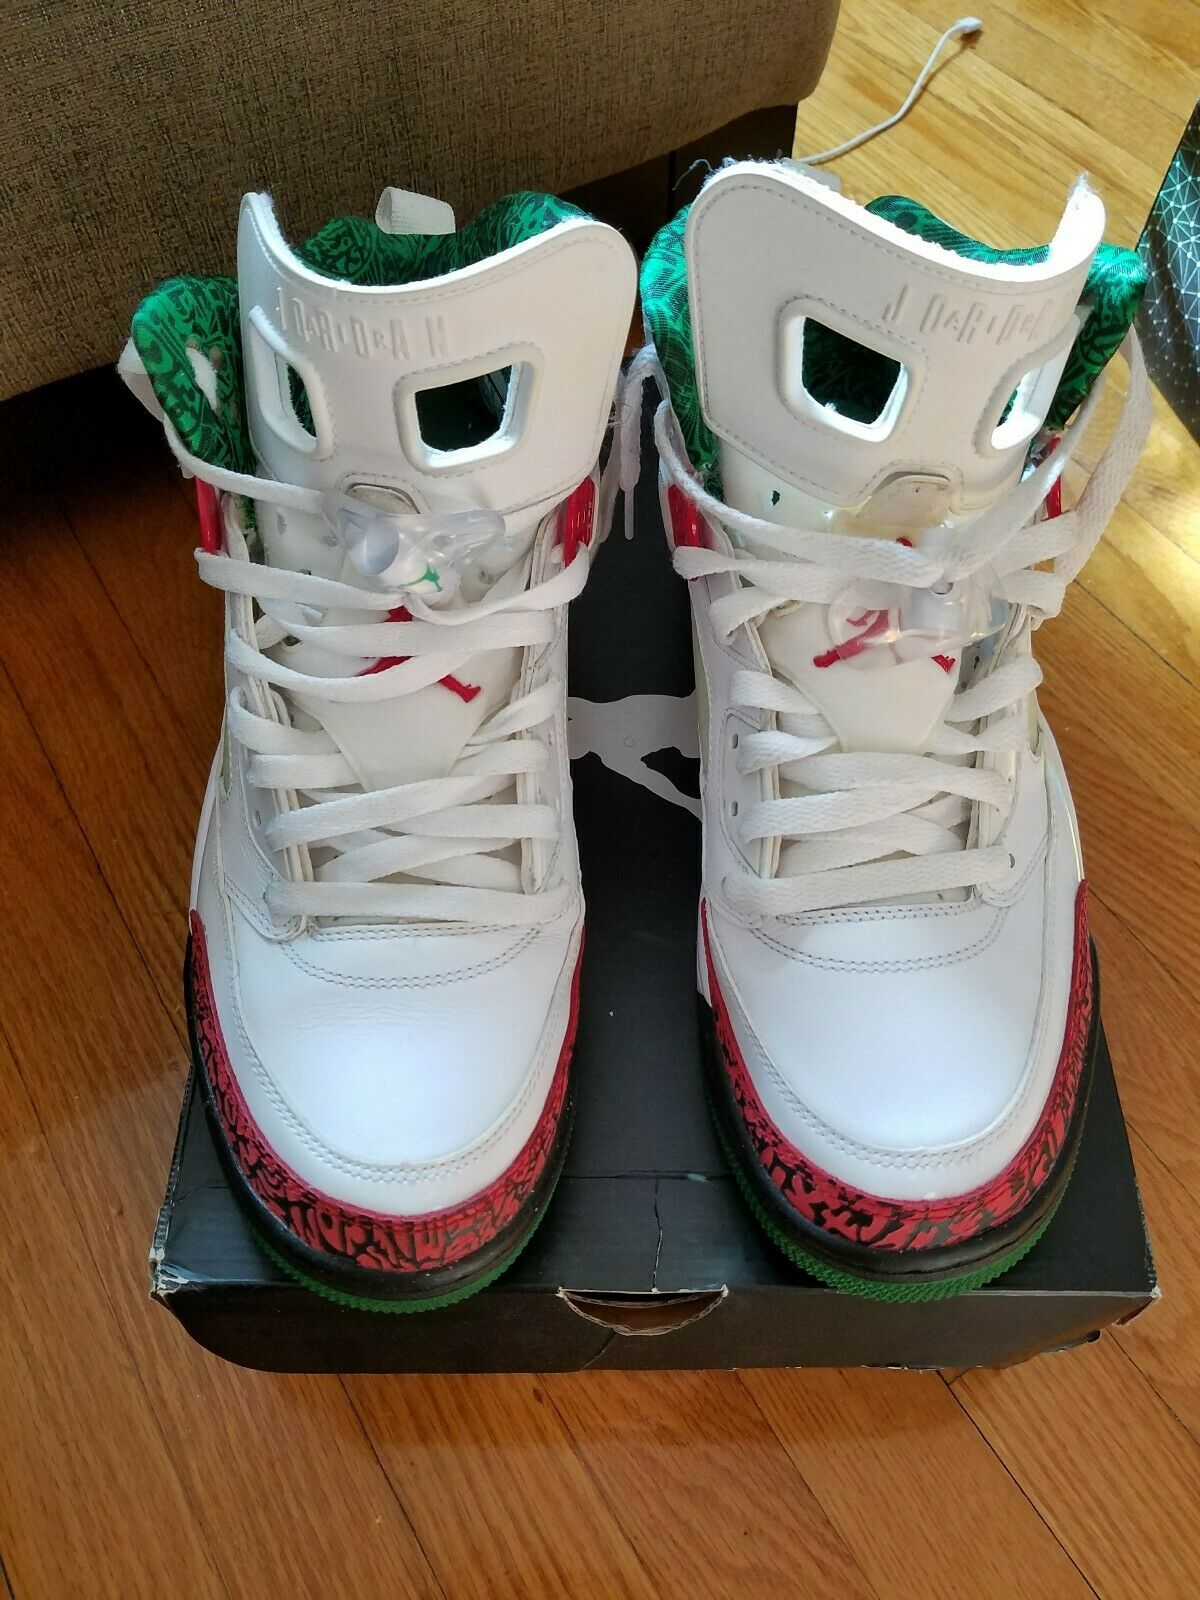 Nike Air Jordan Spizike White 315371 125 Air Max Men's Size 11